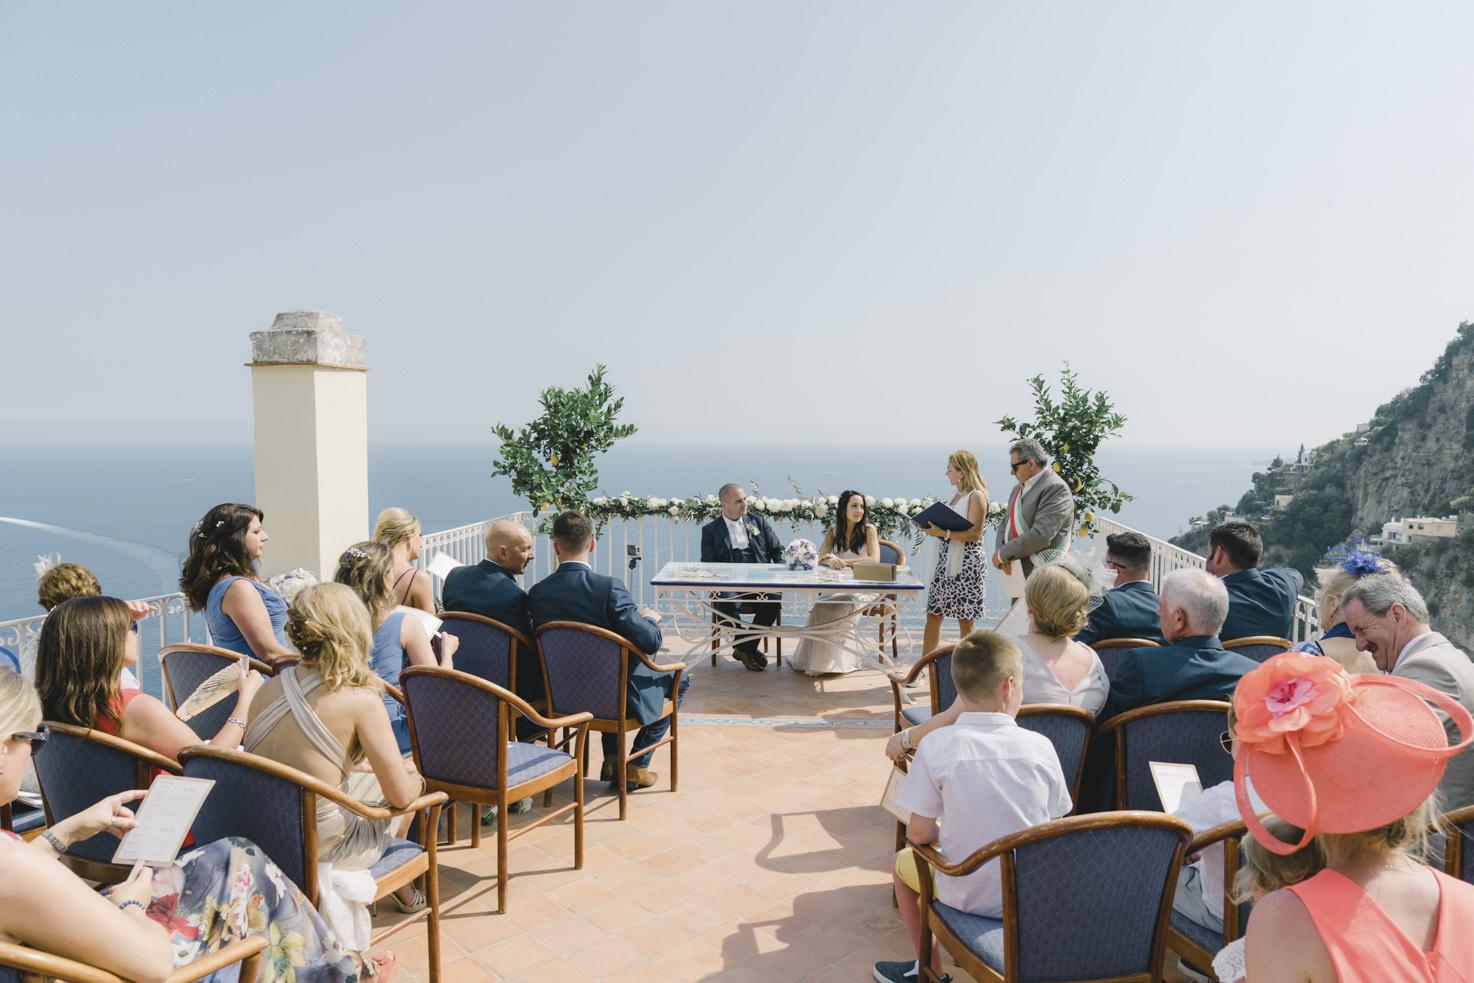 Outdoor civil ceremony in Positano